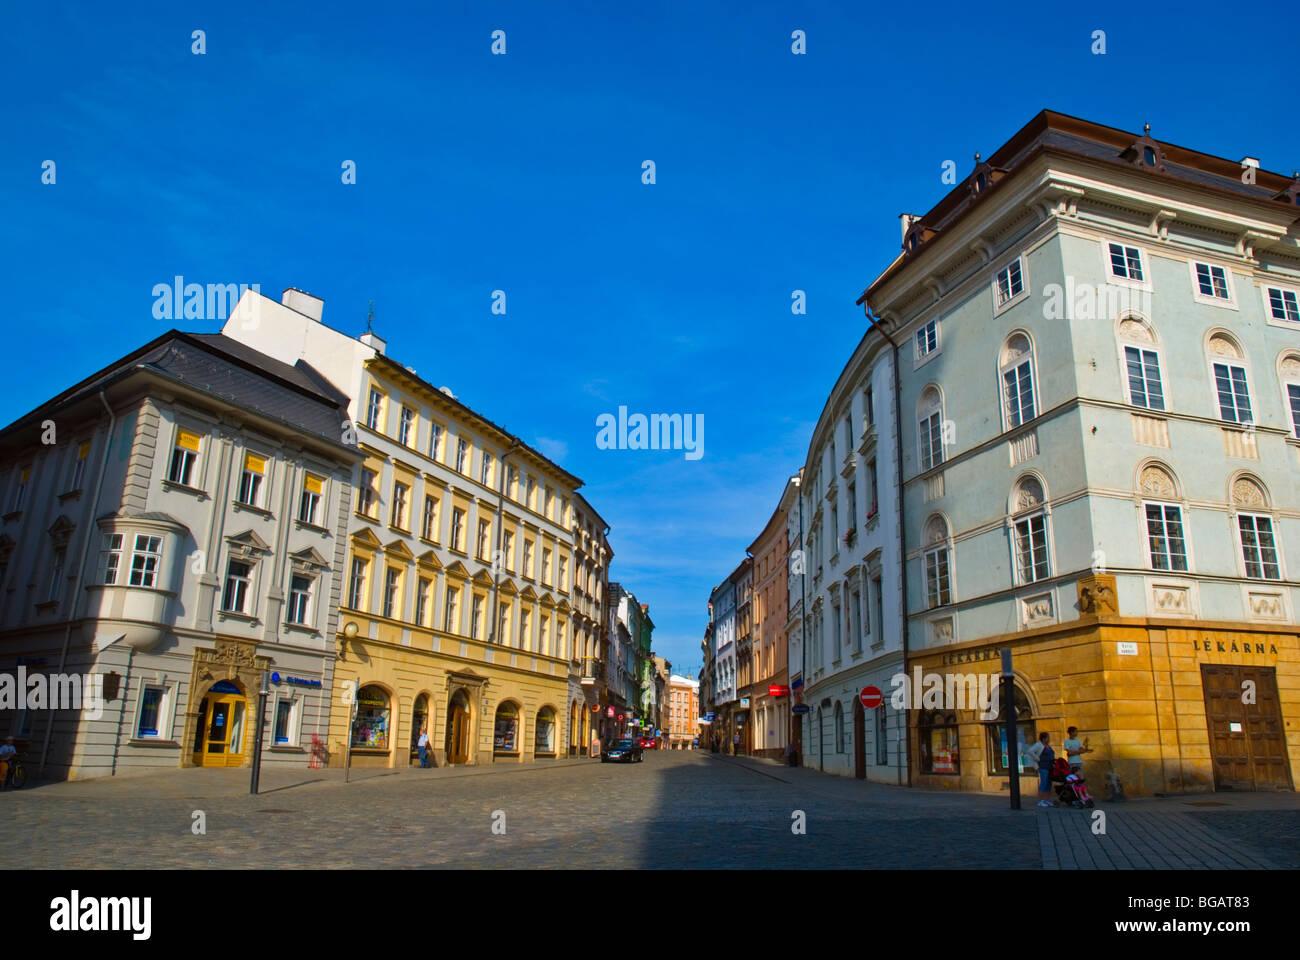 Riegrova street off Horni namesti square in Olomouc Czech Republic Europe - Stock Image